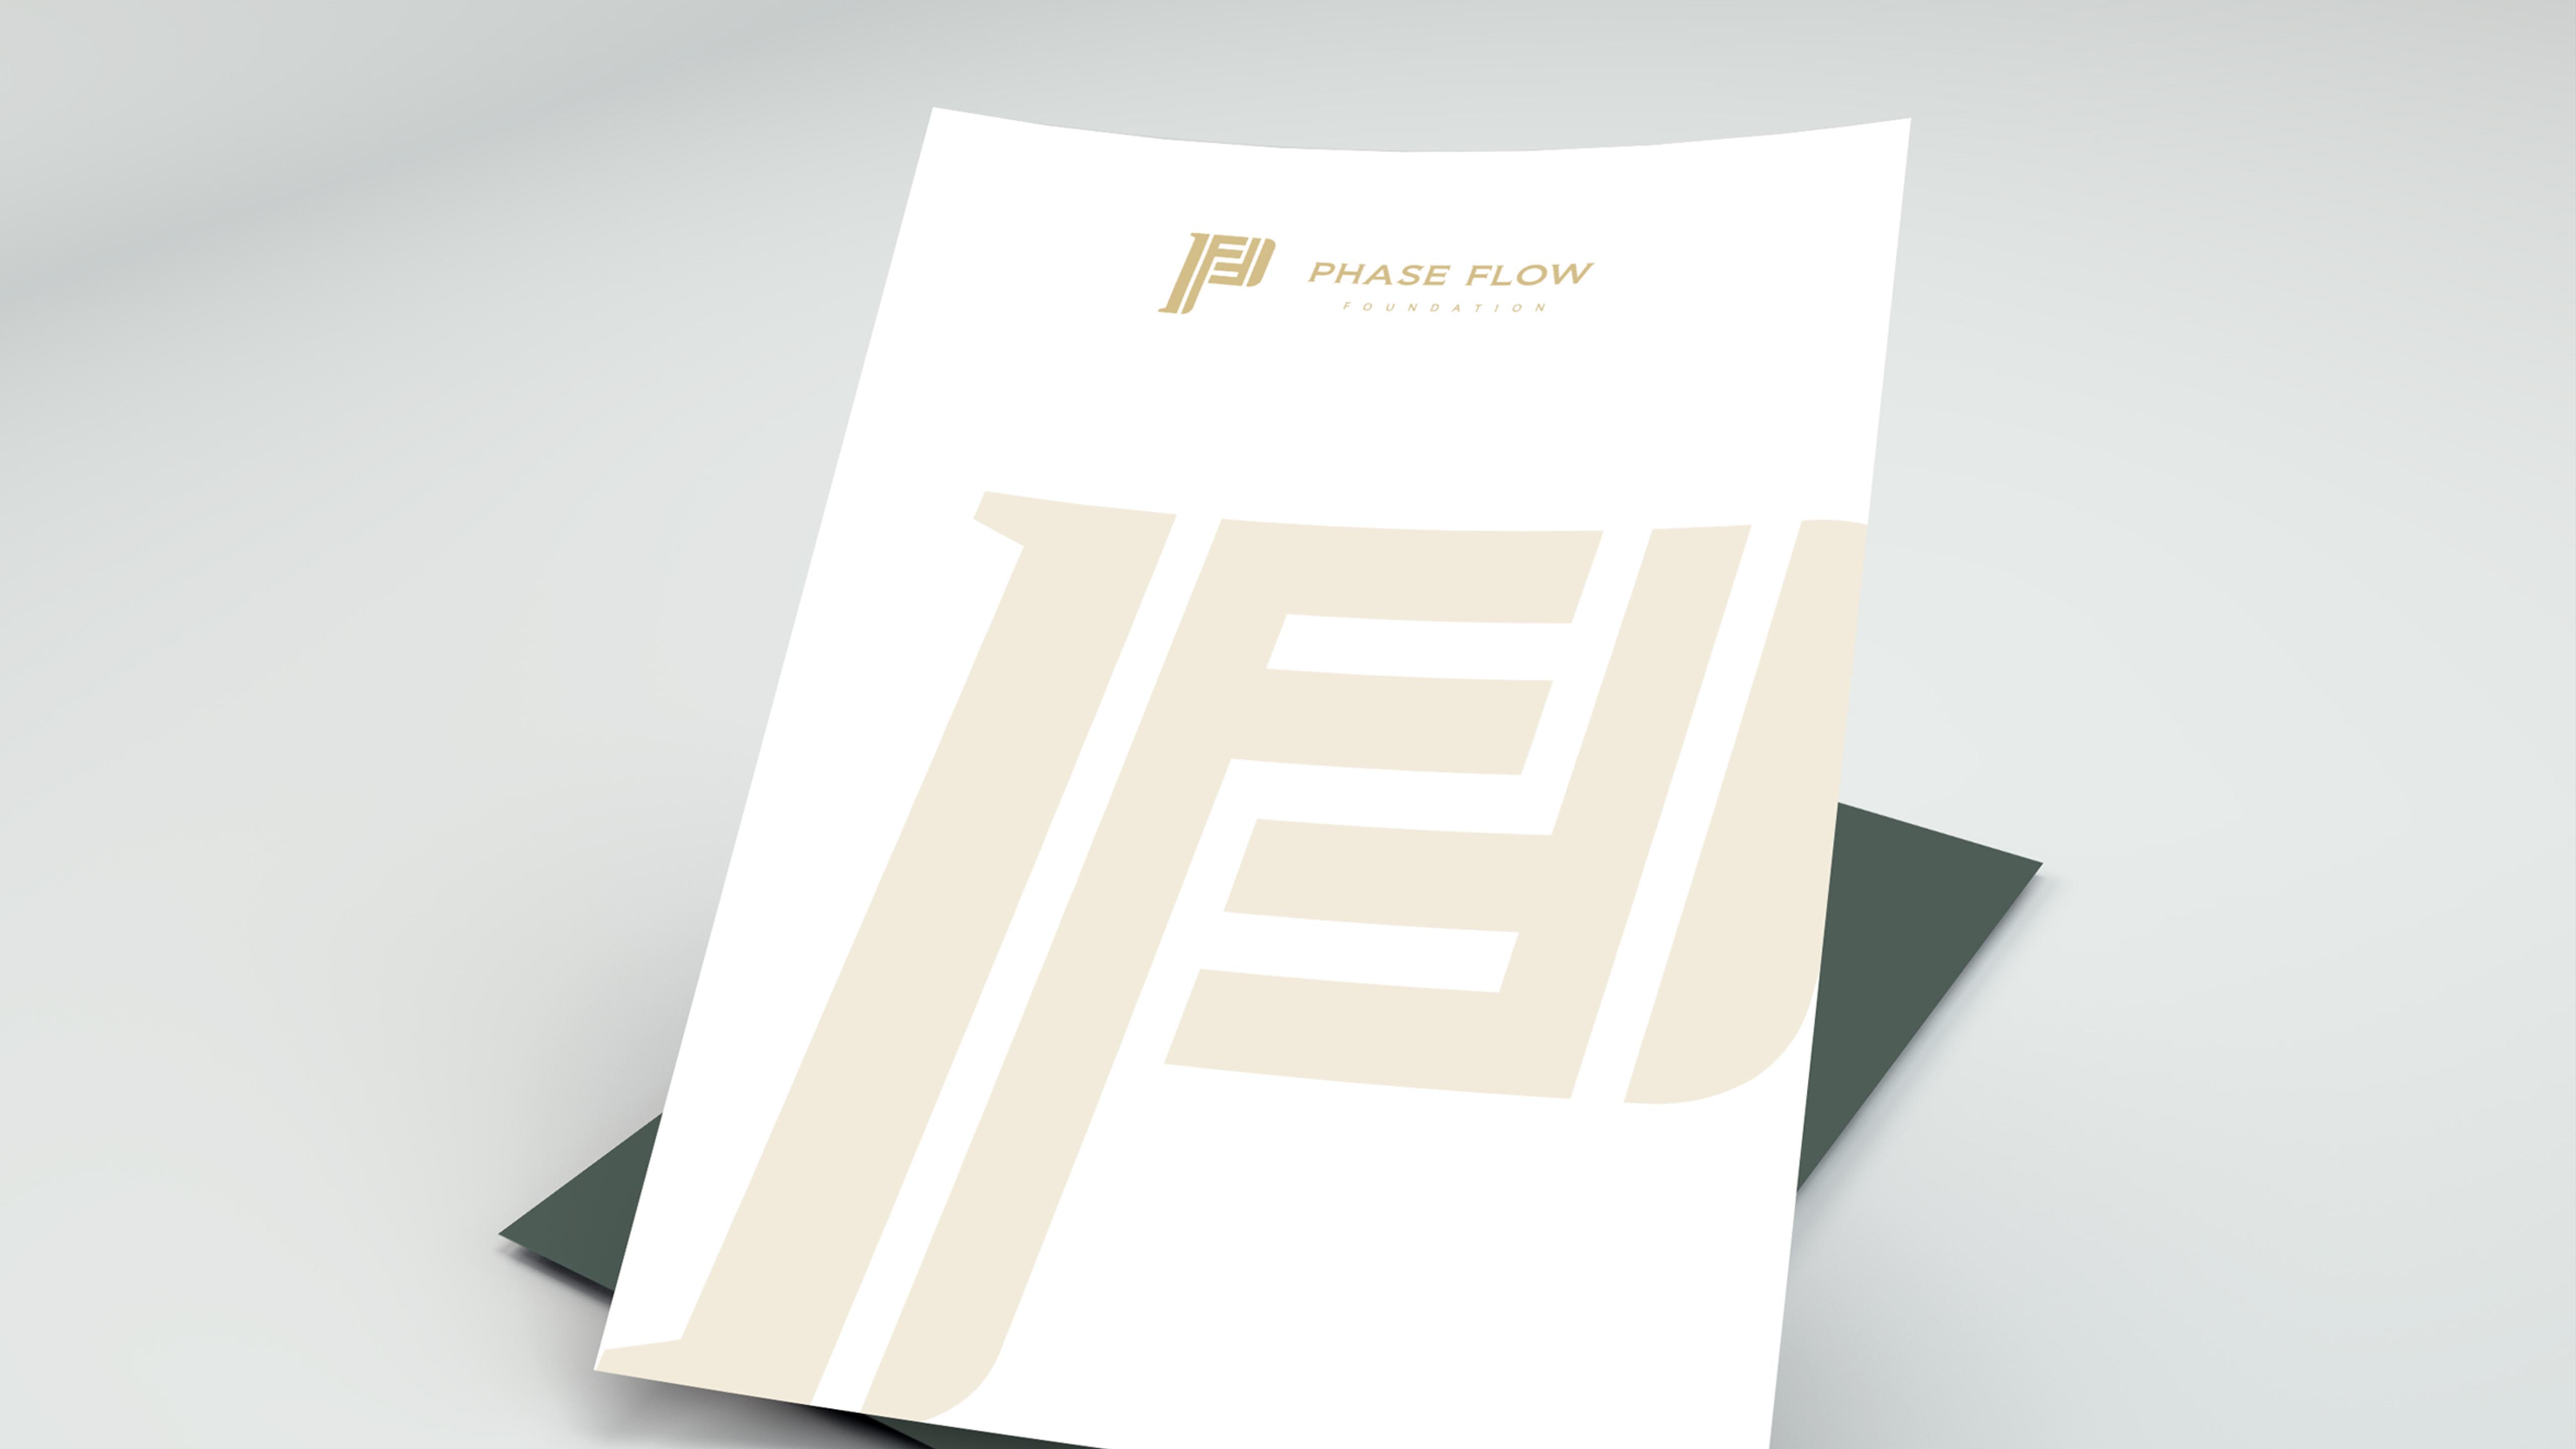 phase flow foundation